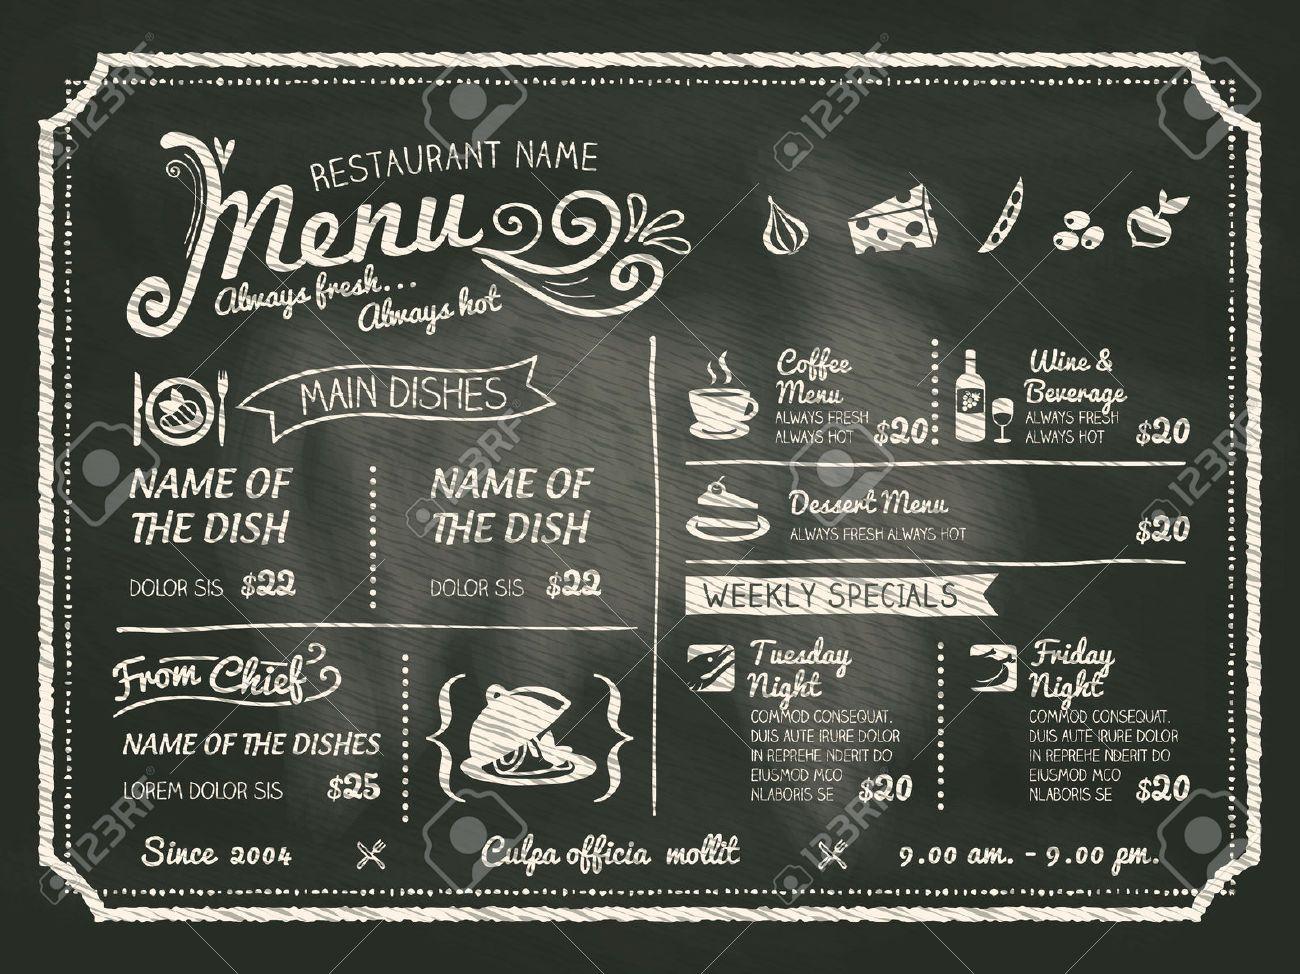 29385396 Restaurant Food Menu Design With Chalkboard Background Stock Vector Jpg 1300 974 Menu Restaurant Food Menu Design Menu Board Restaurant